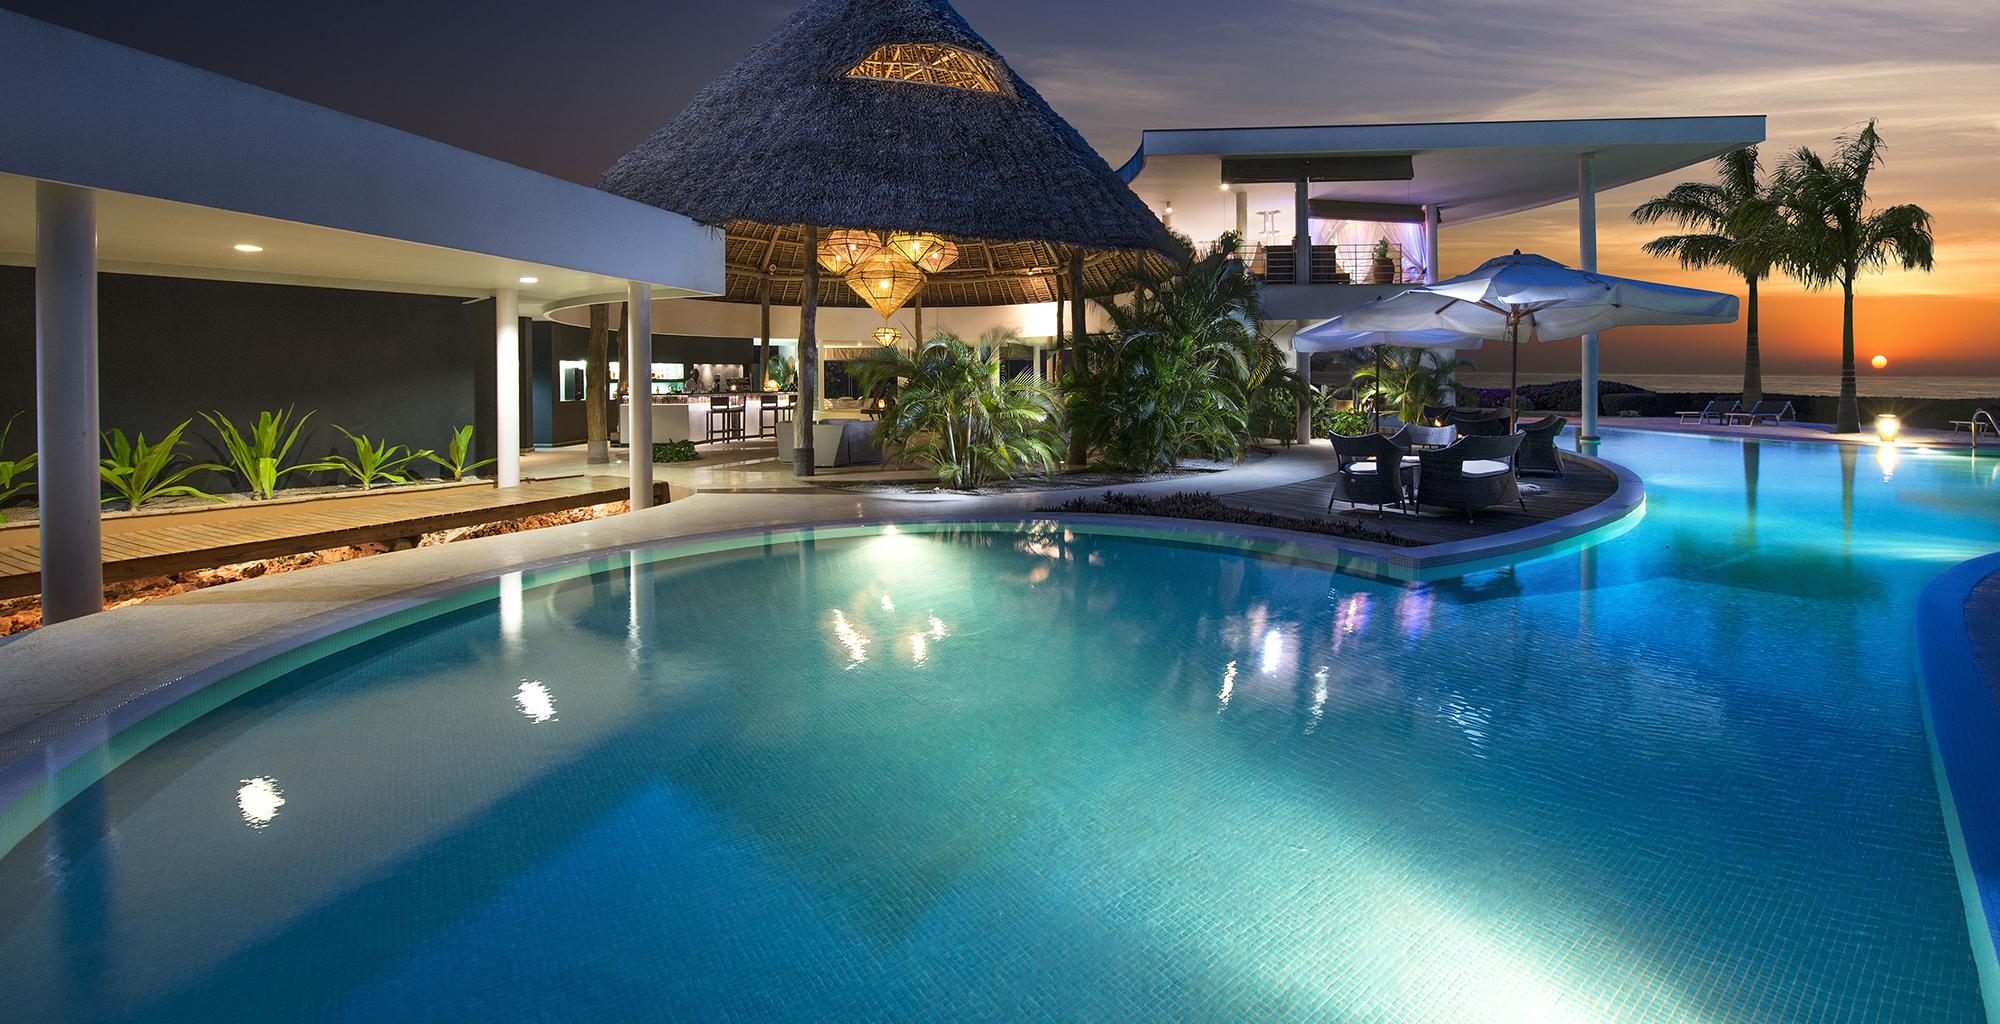 Tanzania-Star-of-the-East-Pool